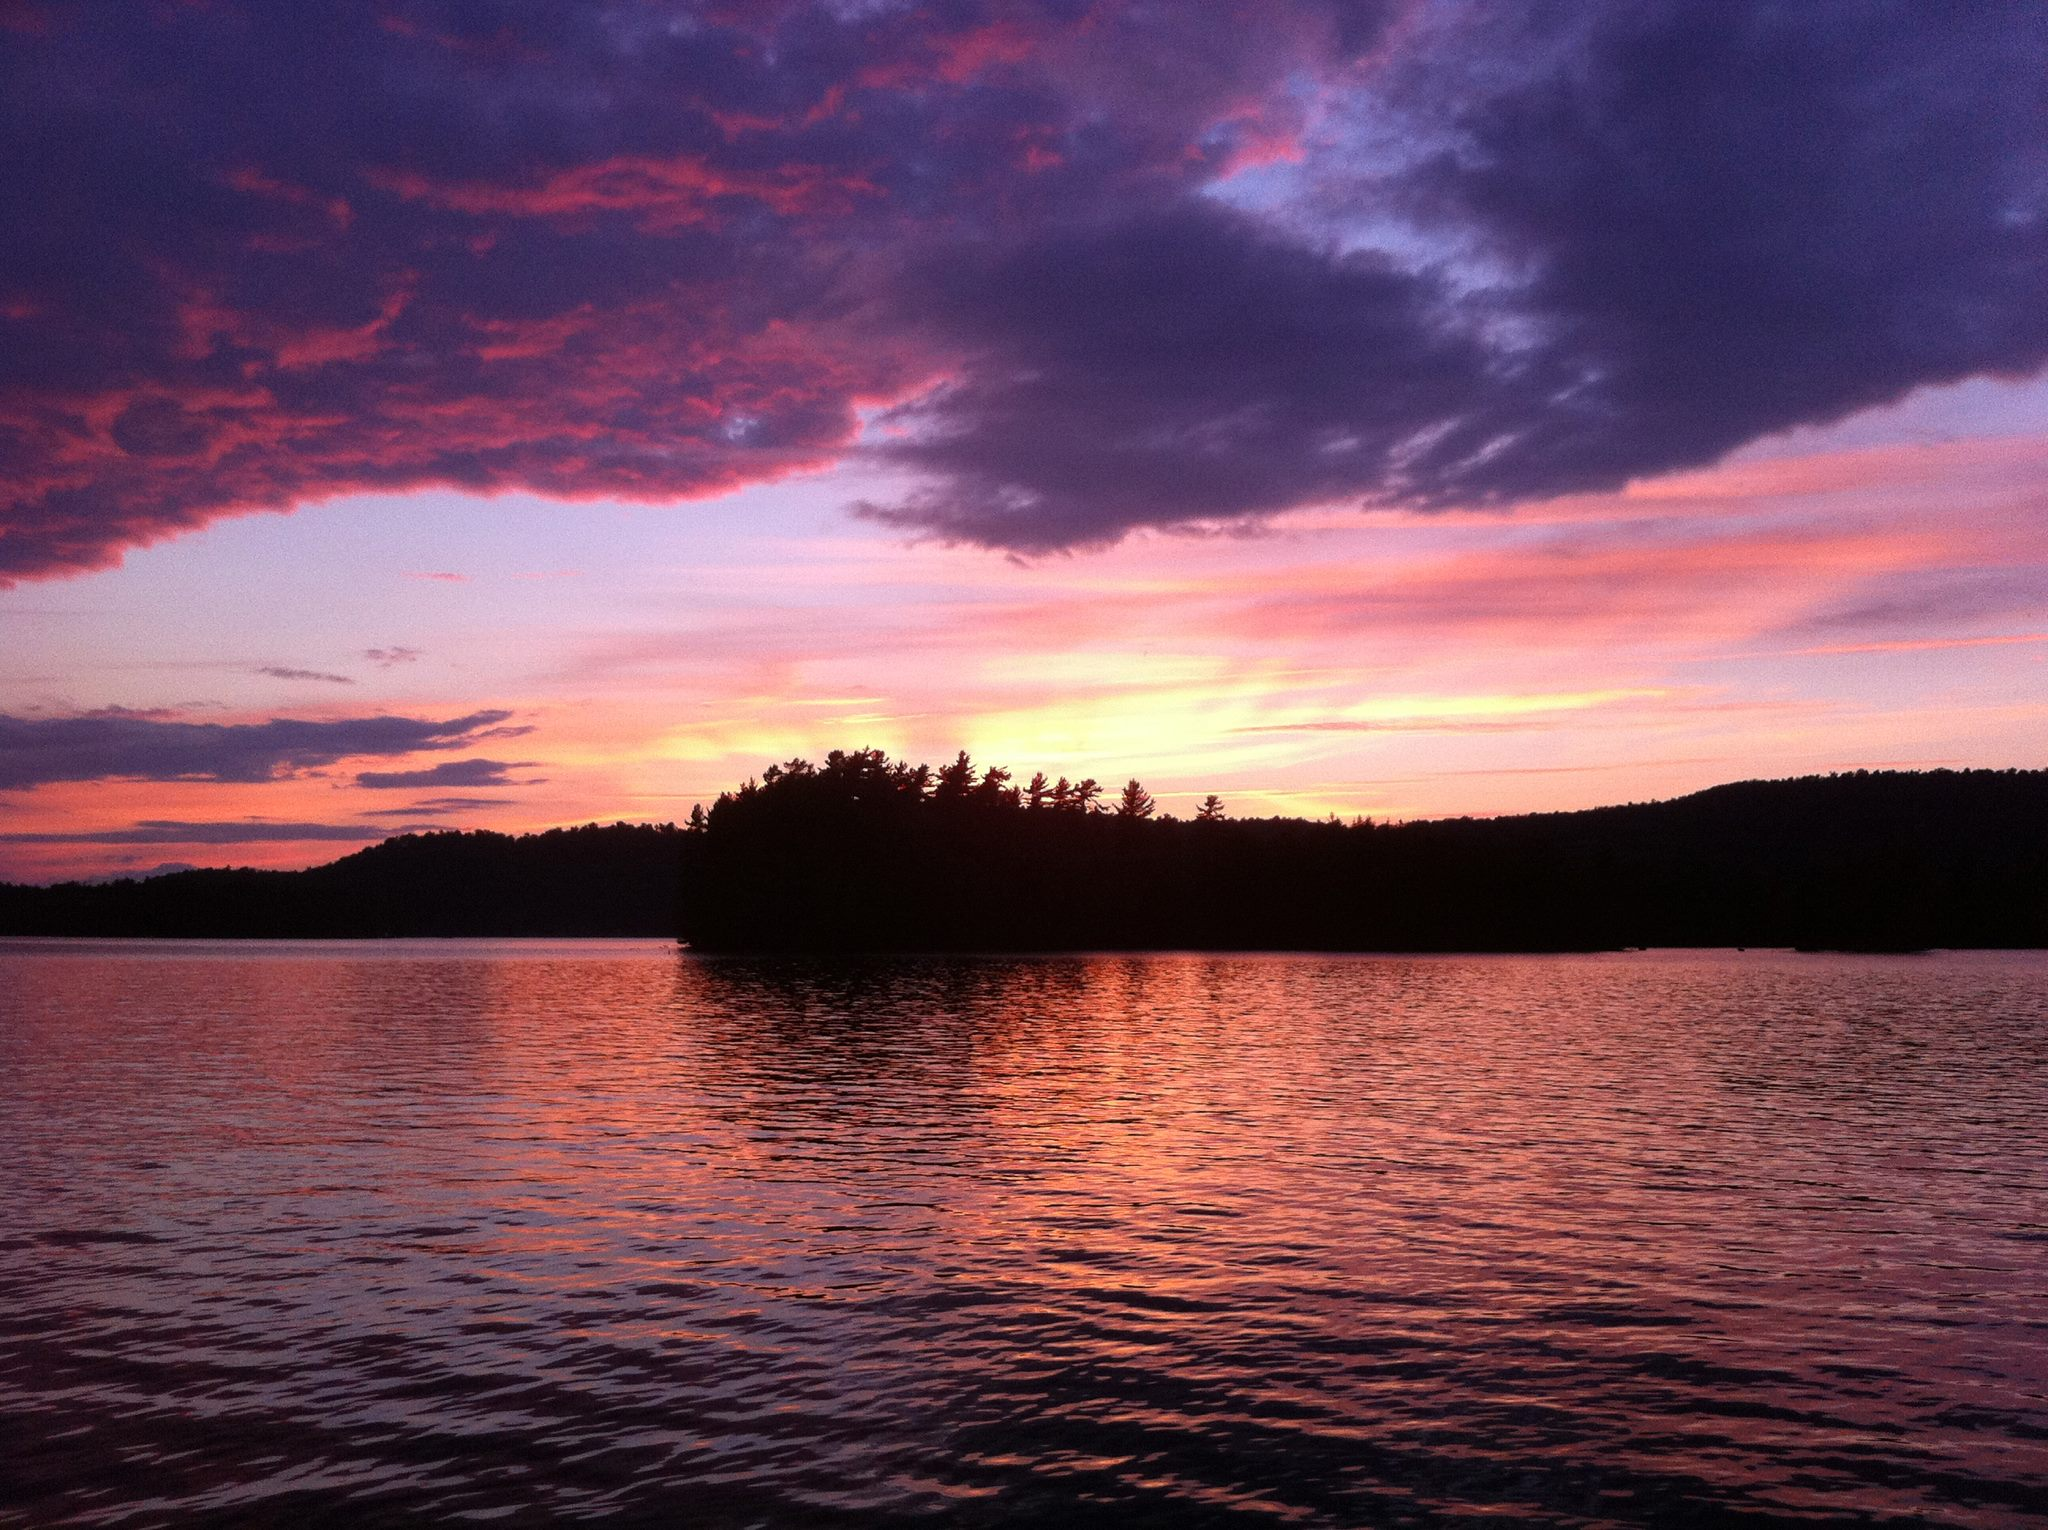 2nd Lake, Fulton Chain of Lakes in the Adirondacks, Photo Credit: David W. Weygandt